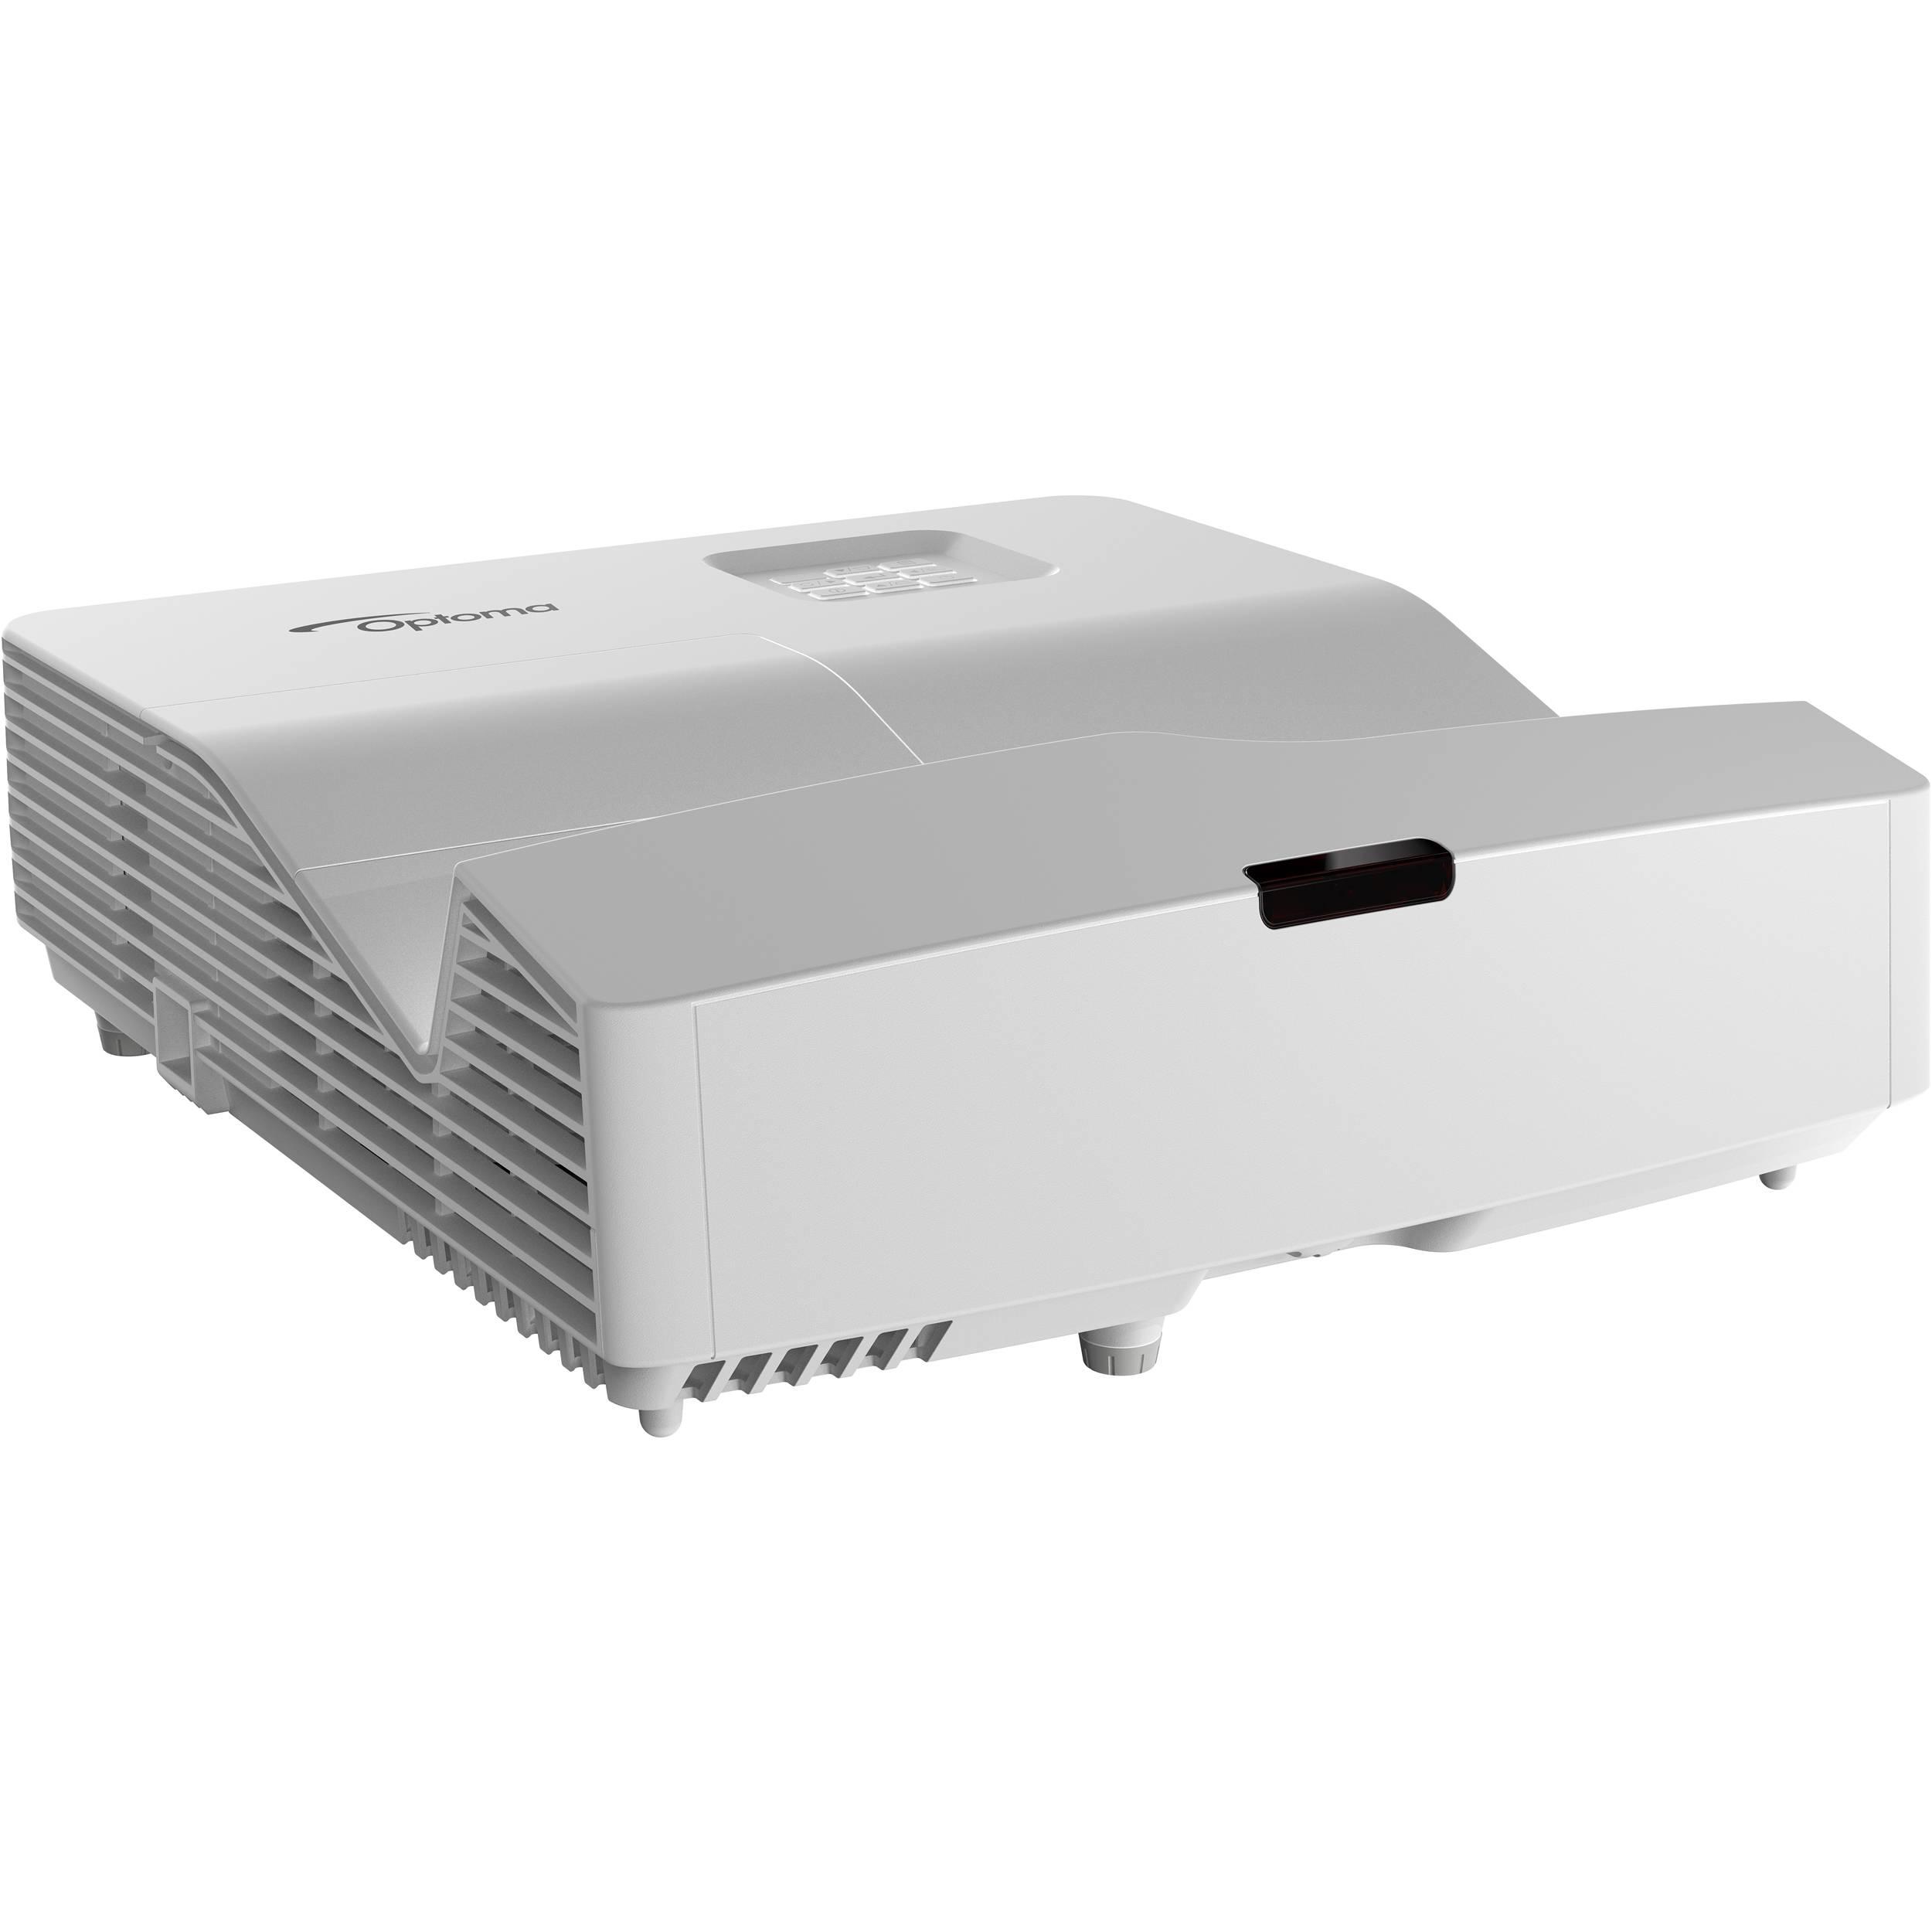 Optoma Technology Gt5600 3600 Lumen Full Hd Ultra Short Home Gt Frames Circuit Board Certificate Frame Throw Dlp Projector